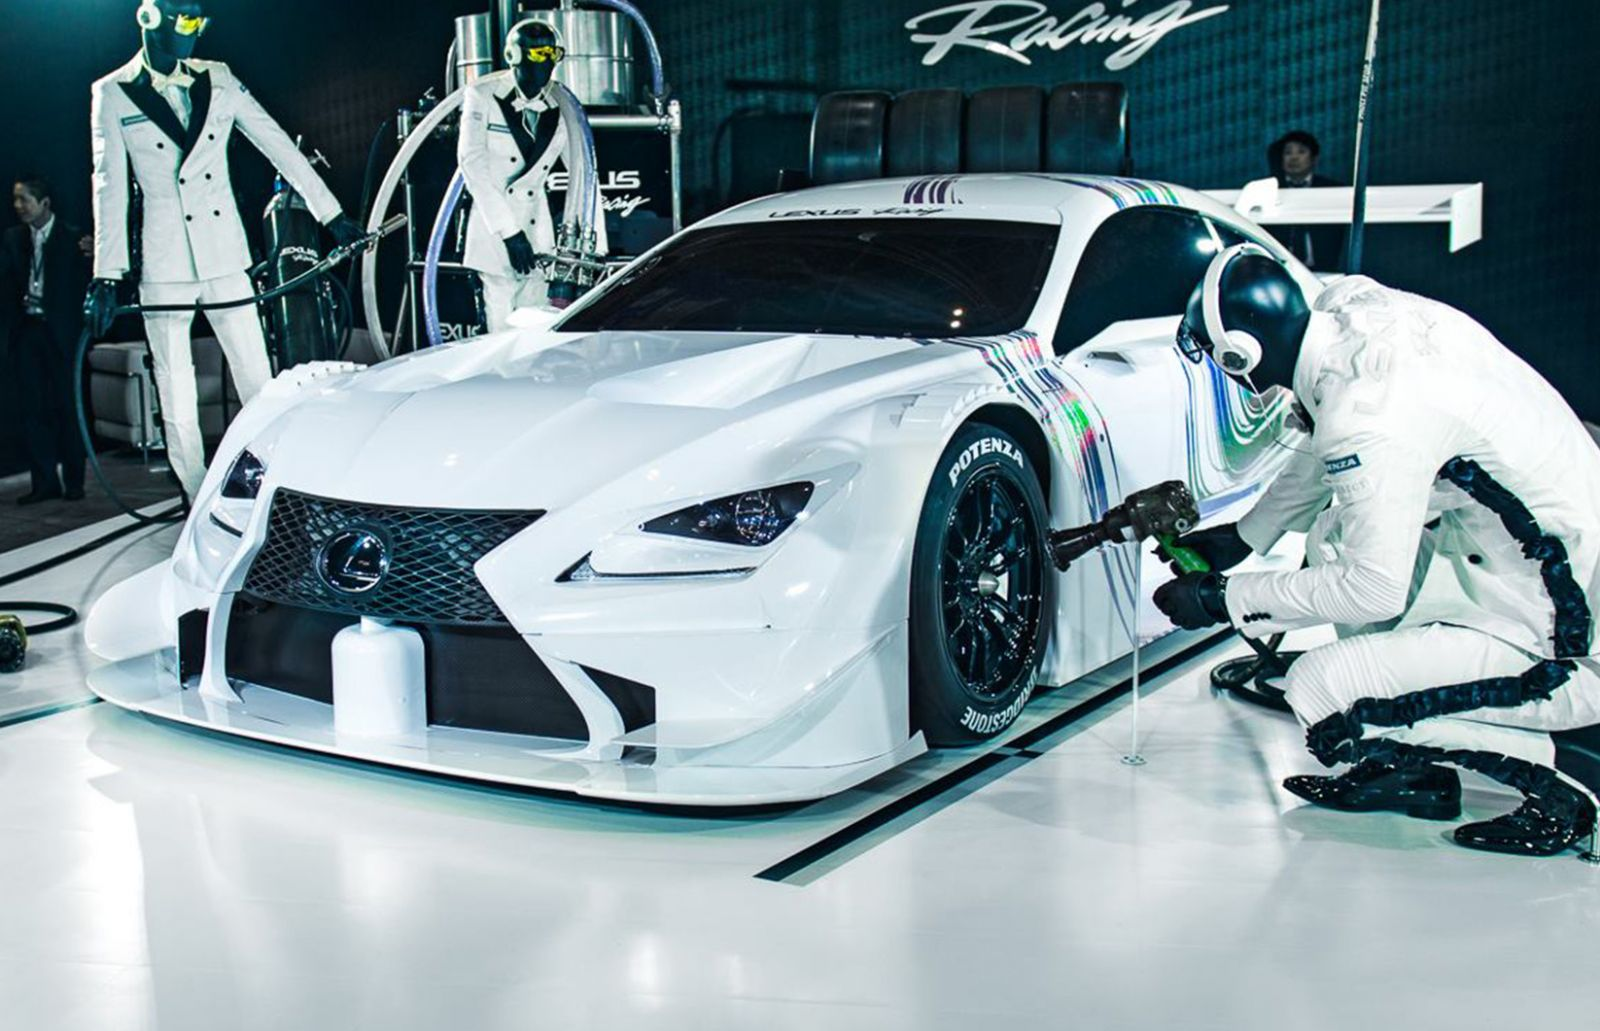 Lexus To Announce V8 Supercar Involvement